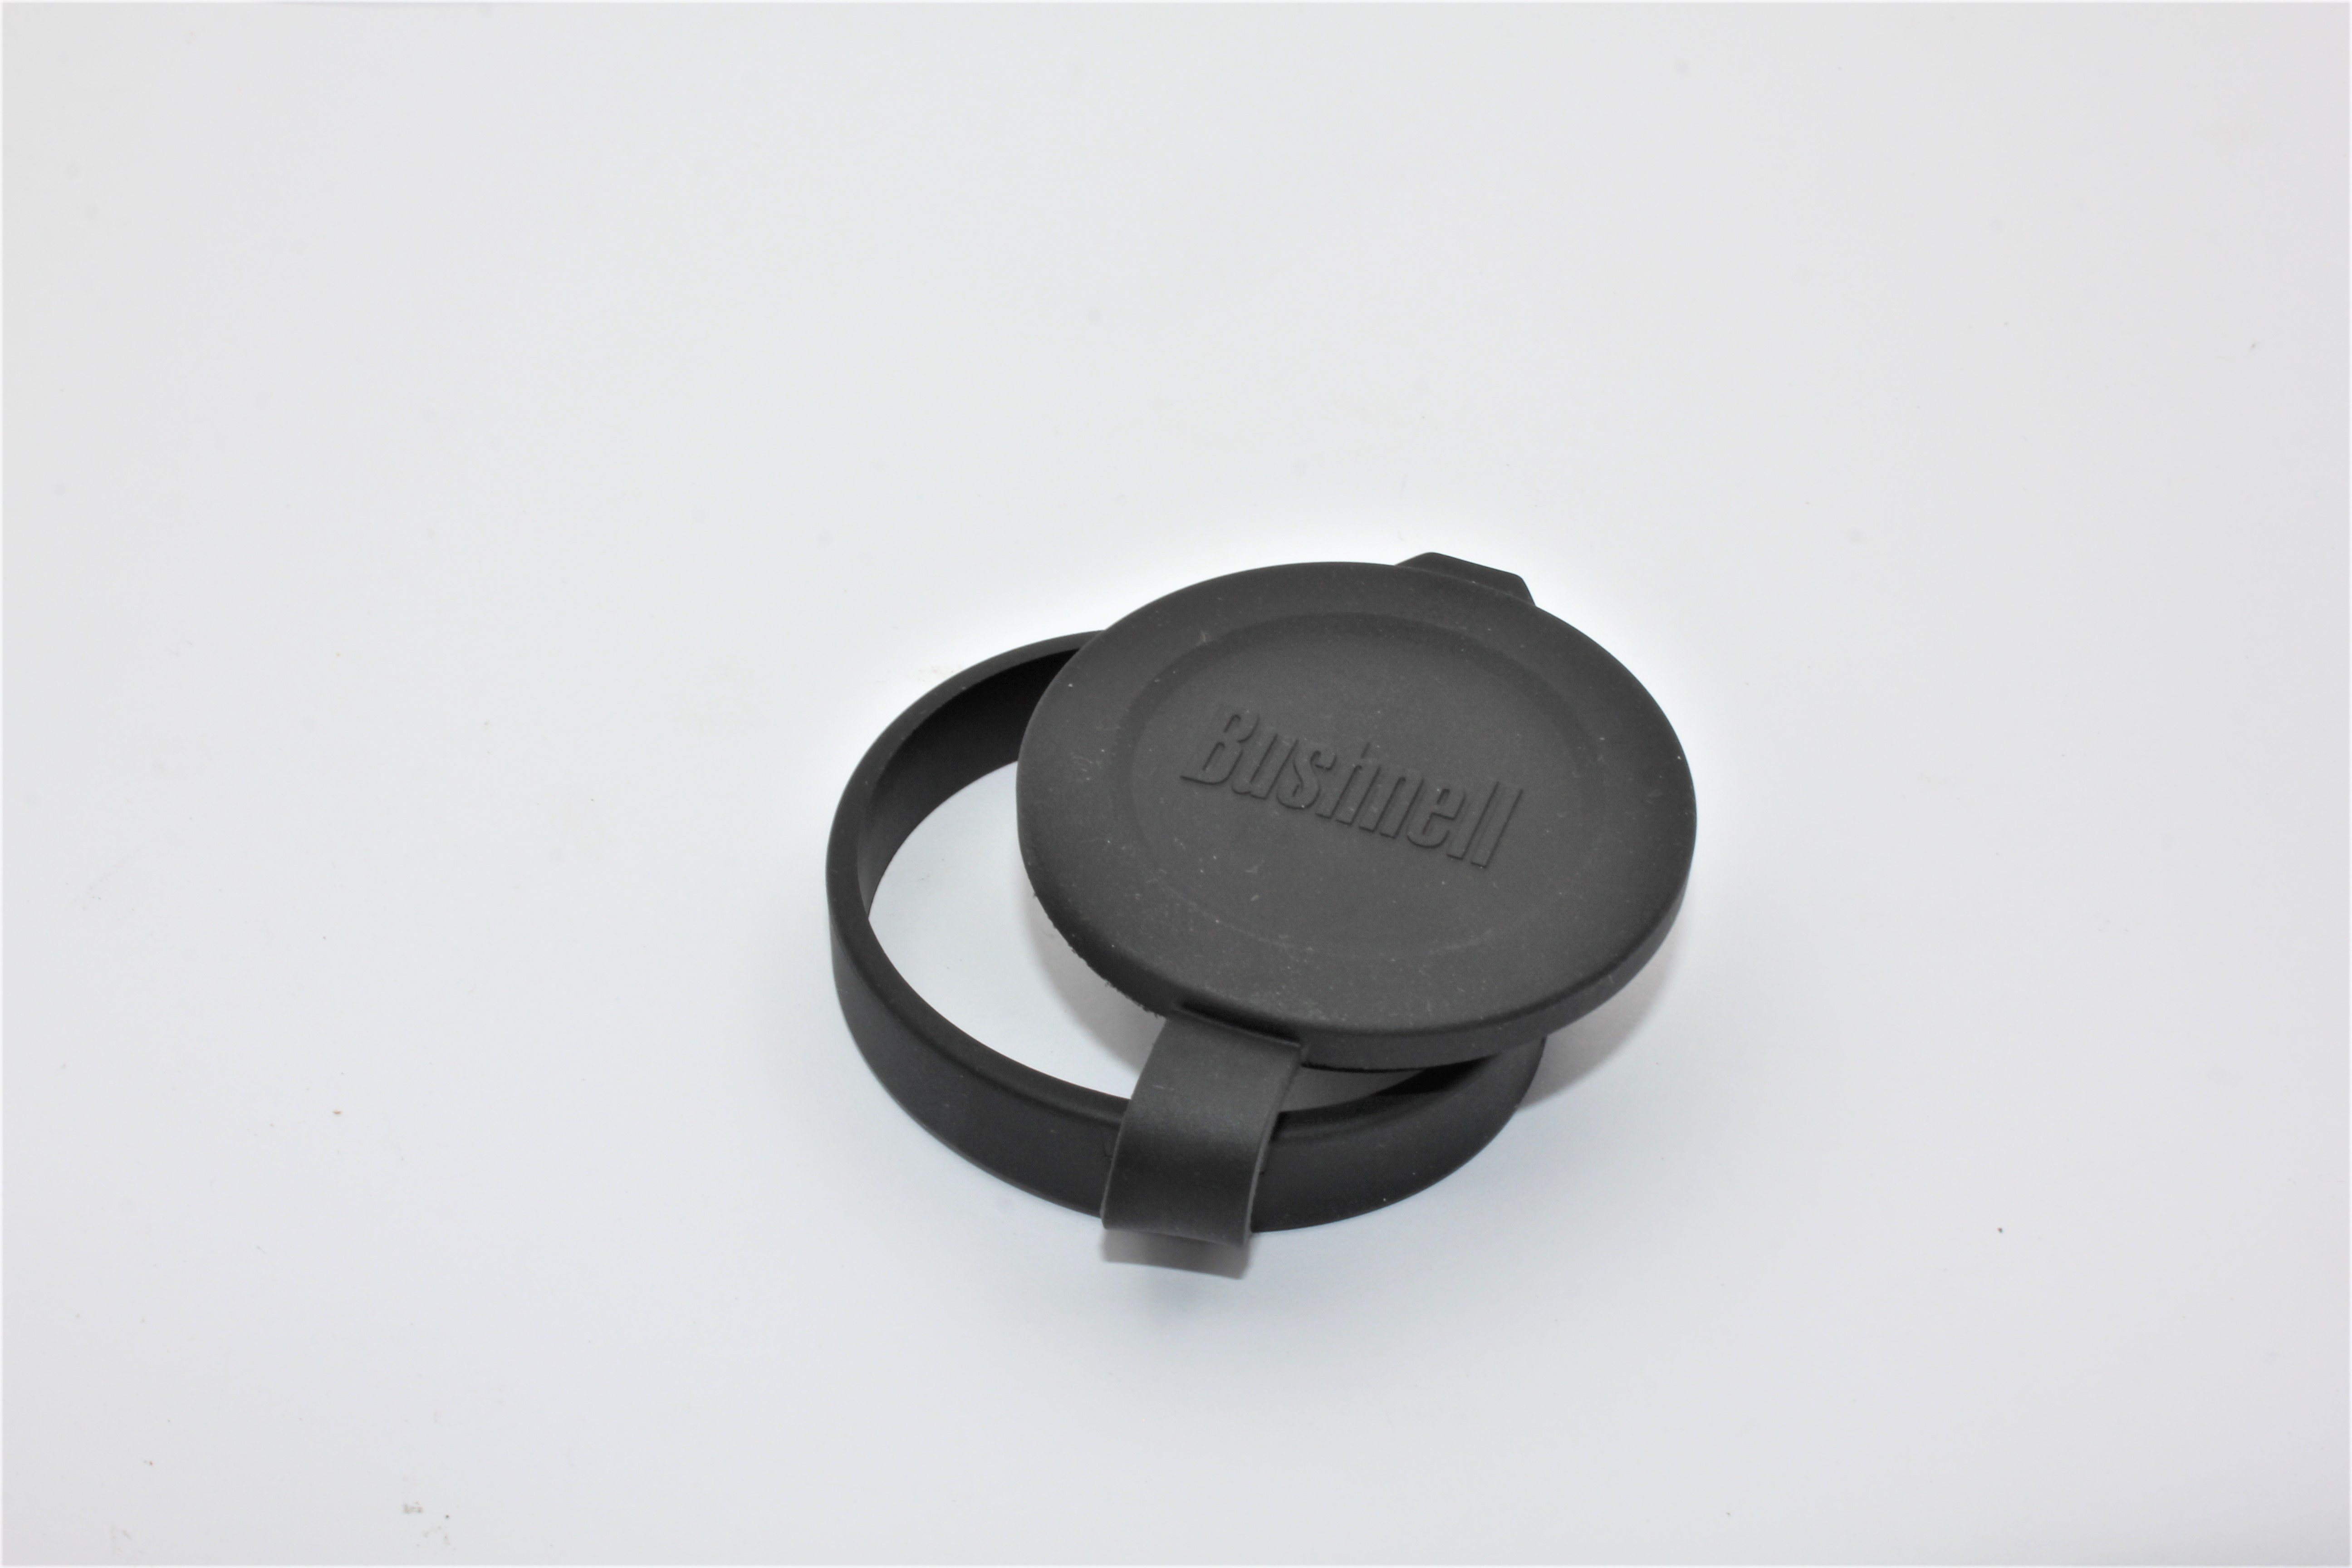 Objective Lens Cap for Bushnell Legend E & L Series #198104 #198105 #198842 #197104 #198104 (Single)